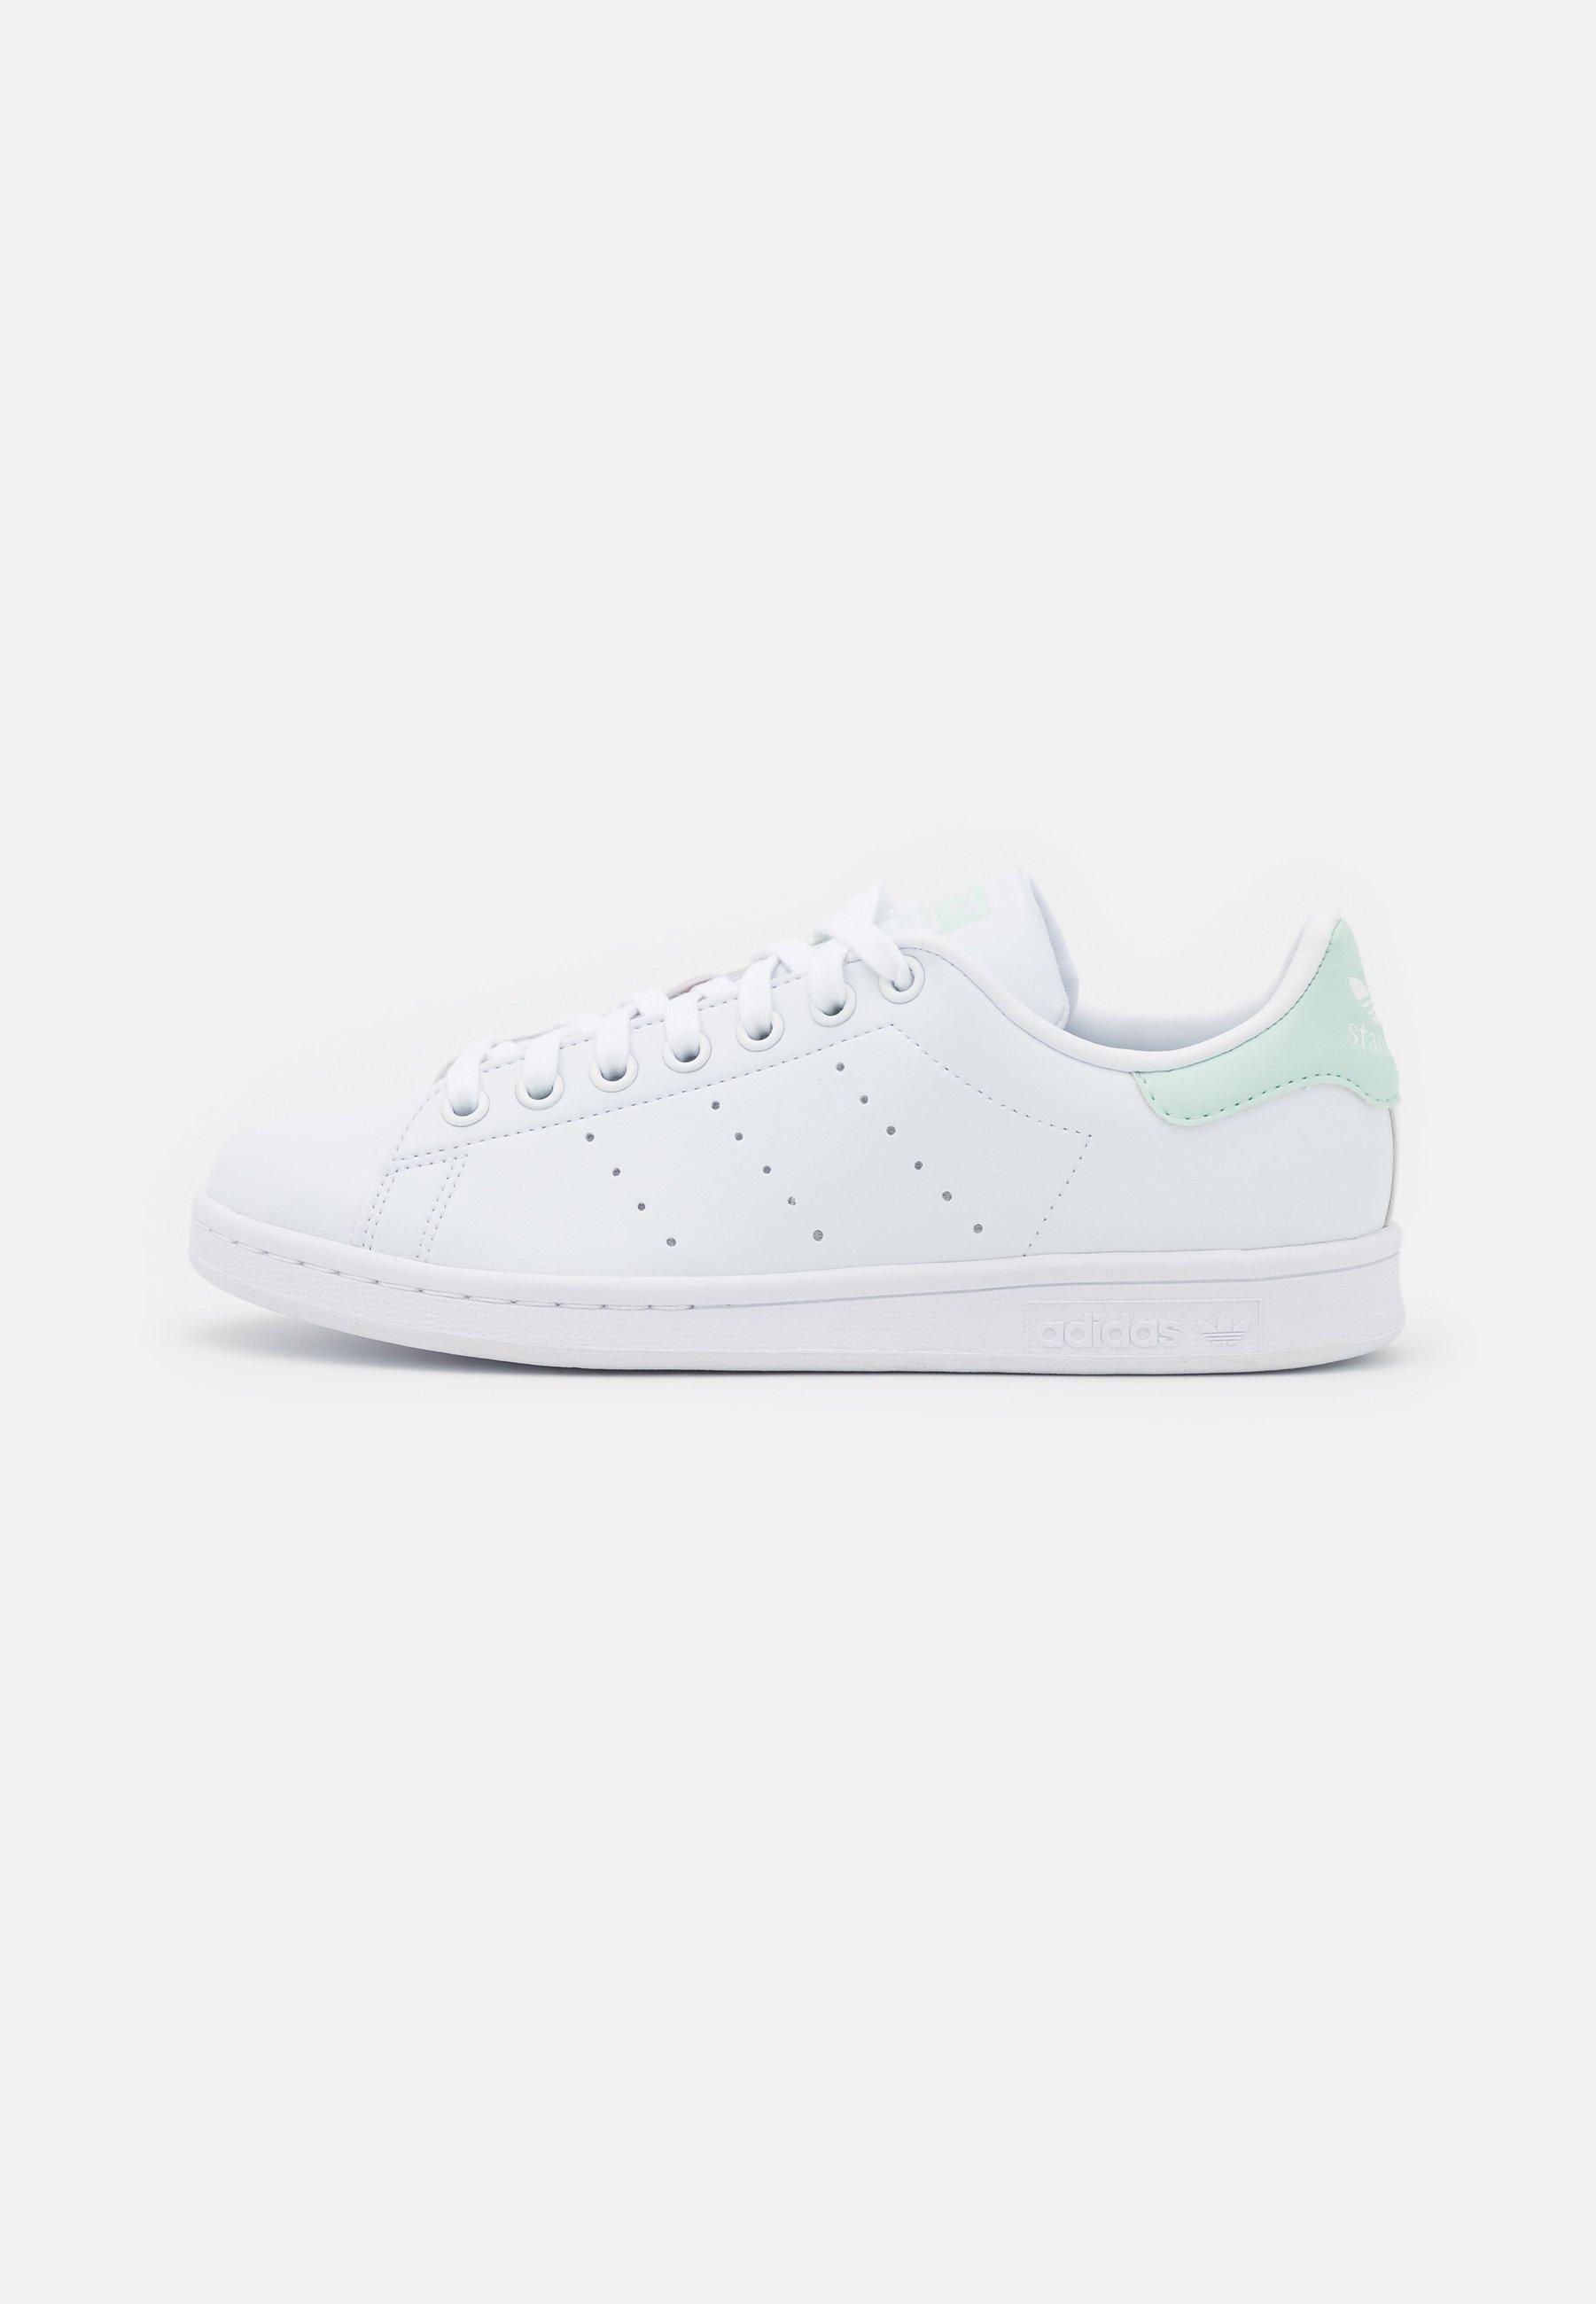 Chaussures femme adidas en ligne | ZALANDO